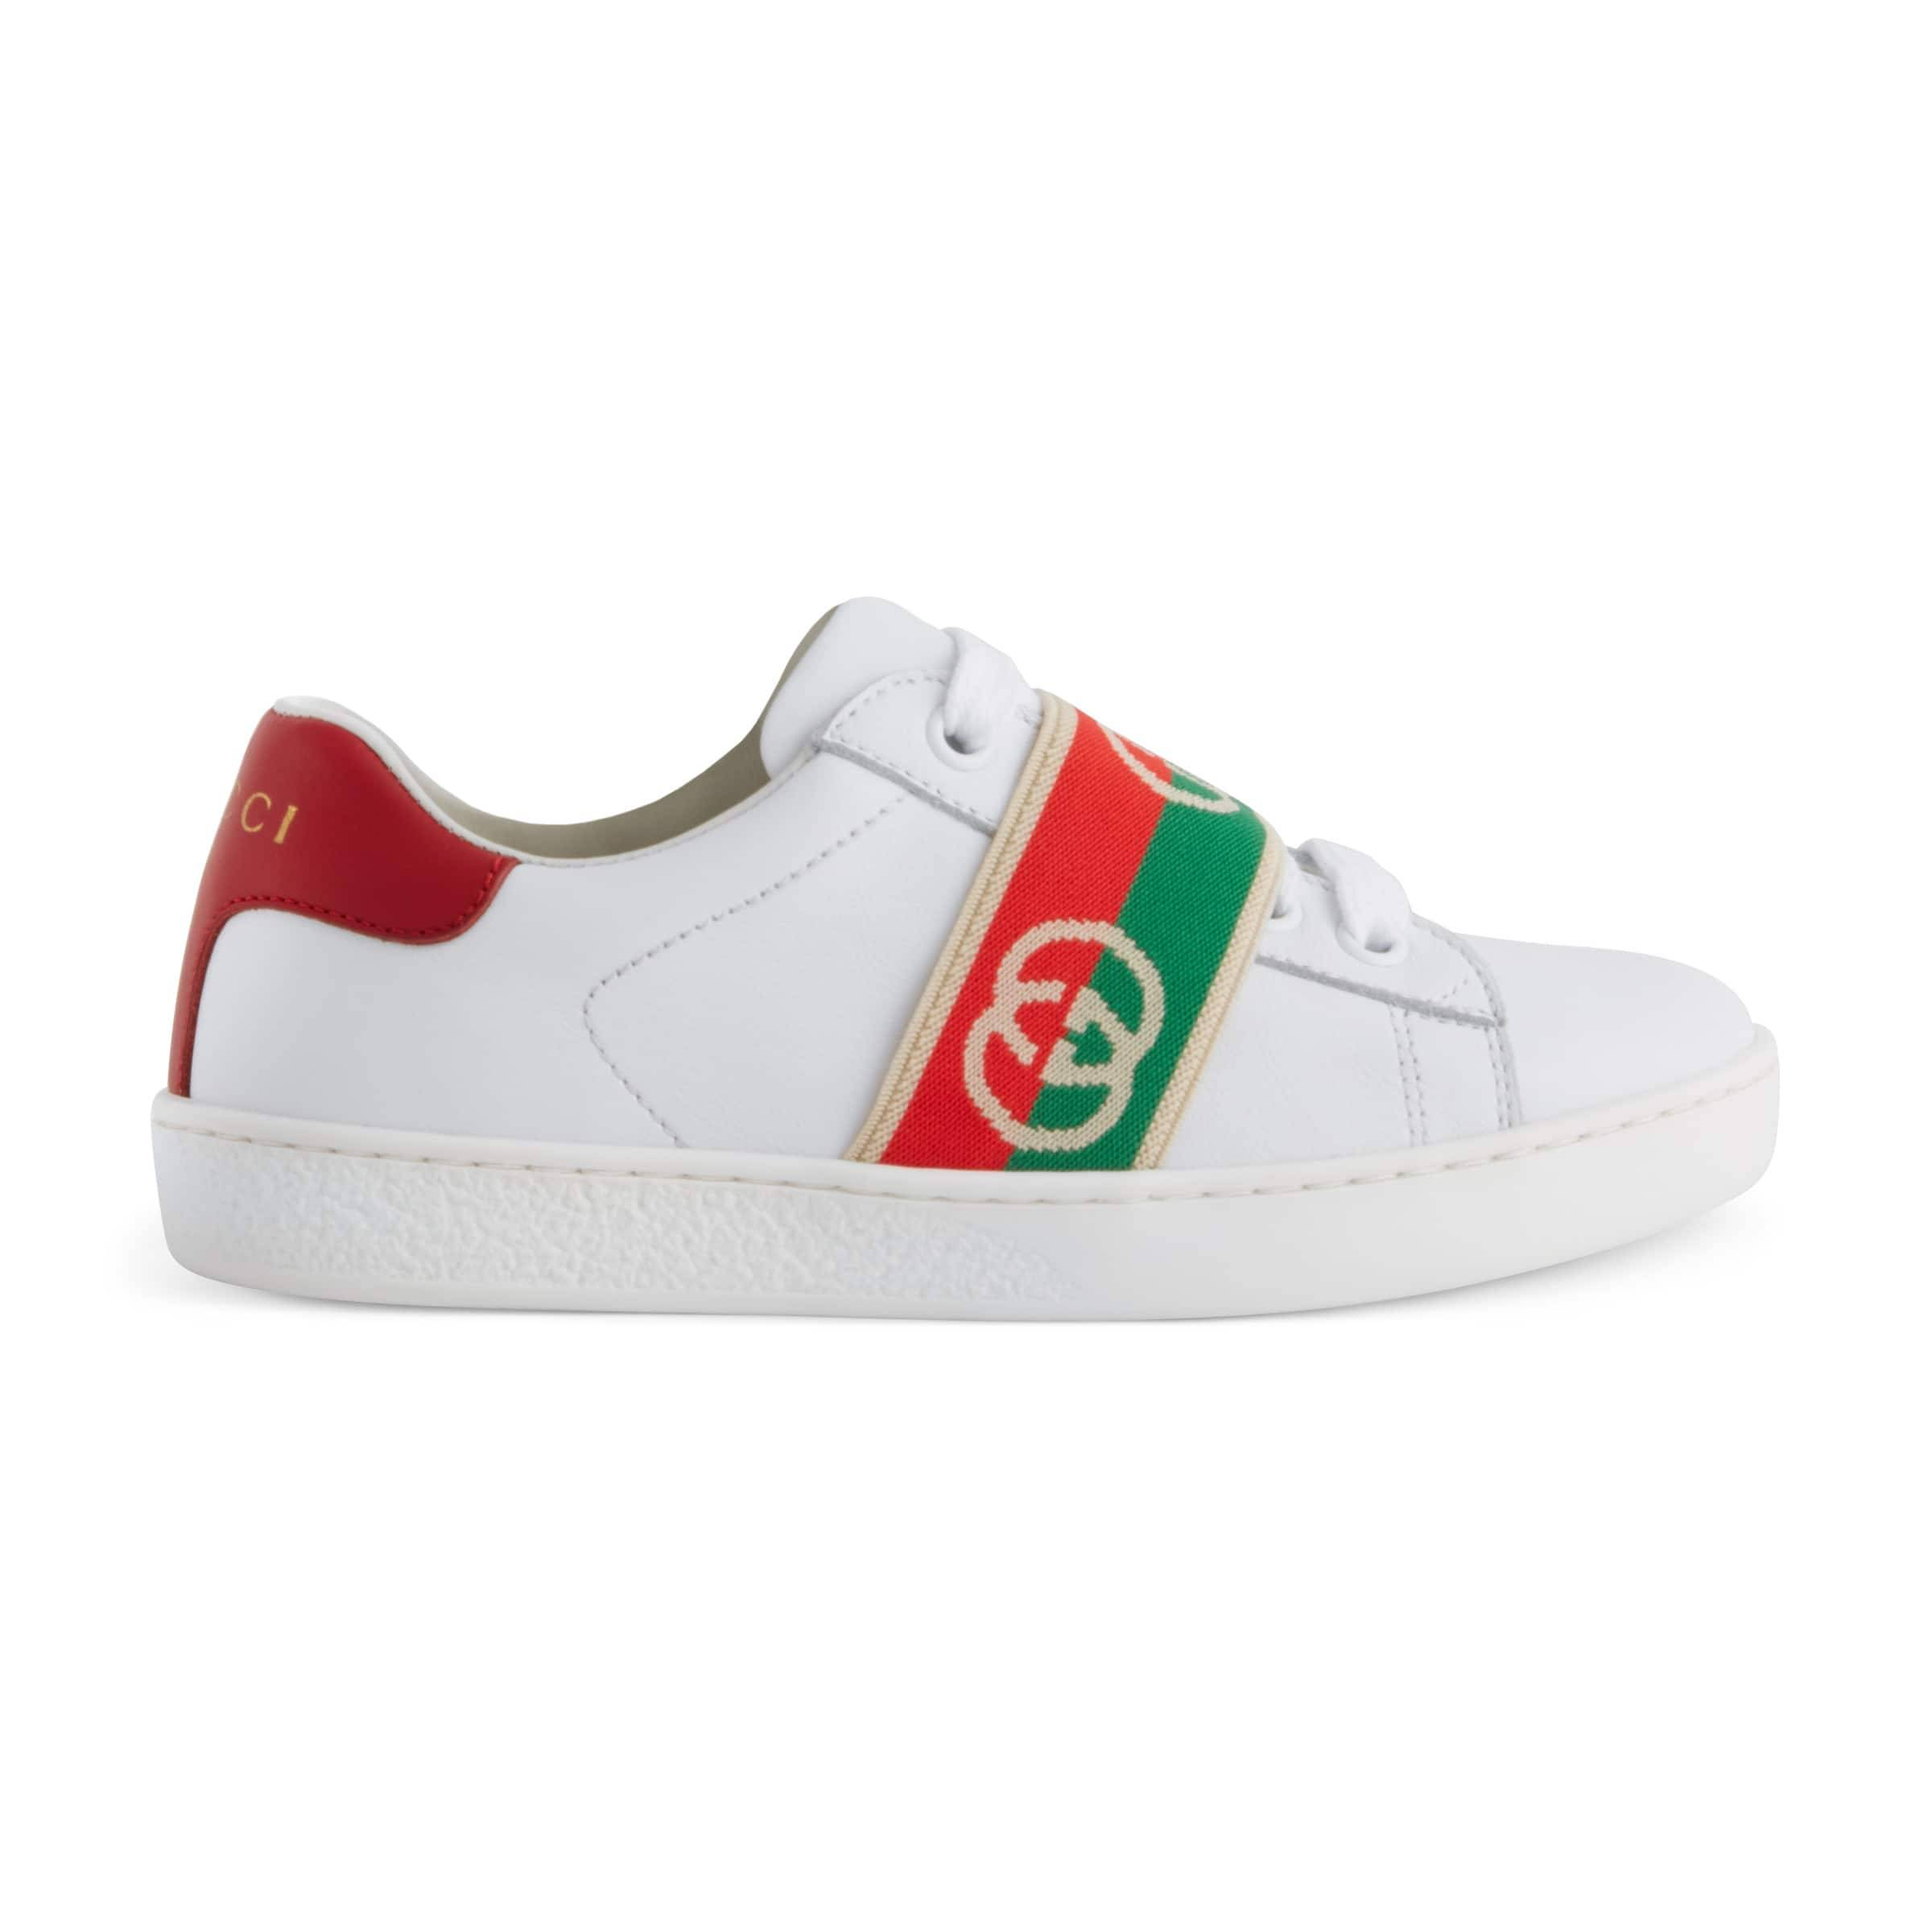 Gucci Children's Ace sneaker with Interlocking G  - White